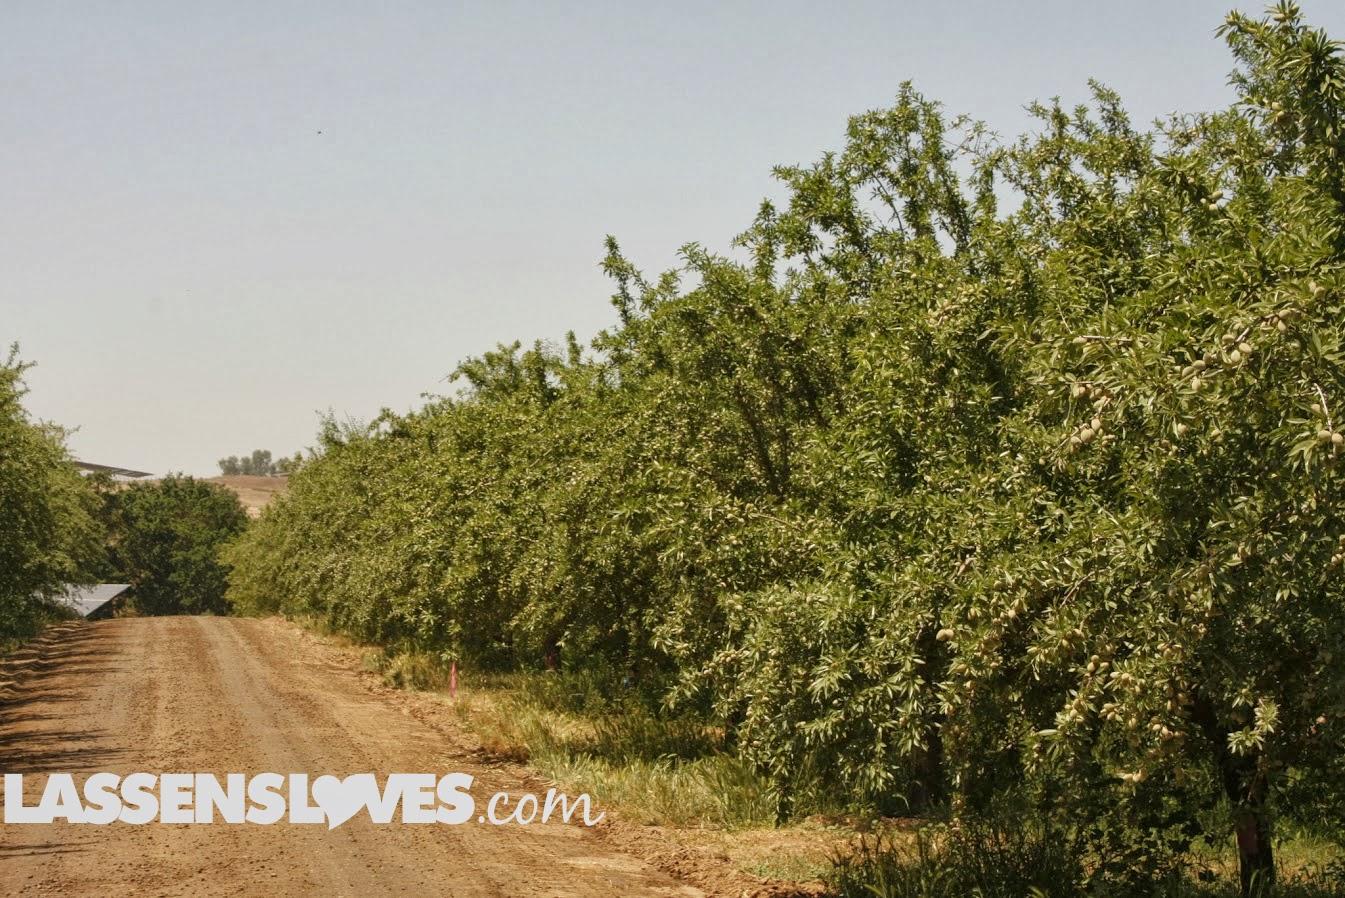 lassensloves.com, Lassen's, Lassens, organic+produce, almond+trees, why+eat+organic